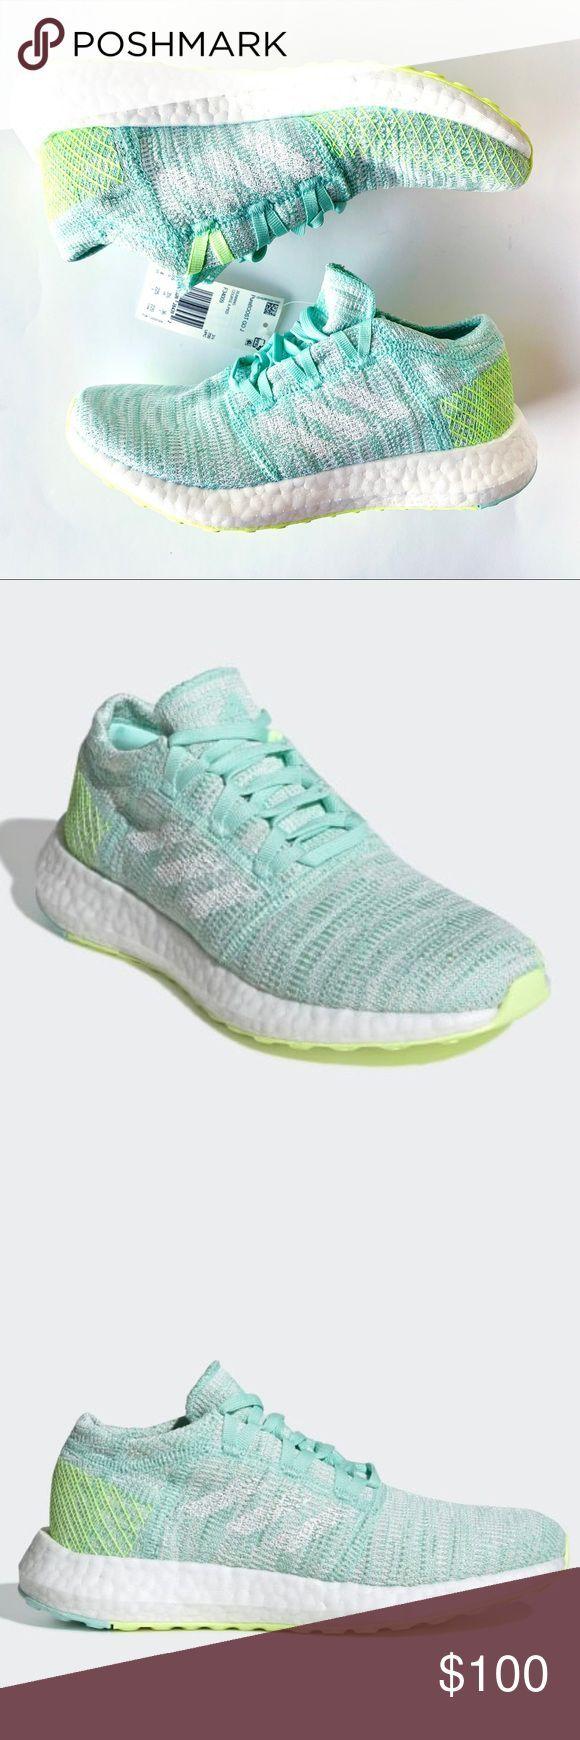 New Adidas PureBOOST Go J Youth Size 4